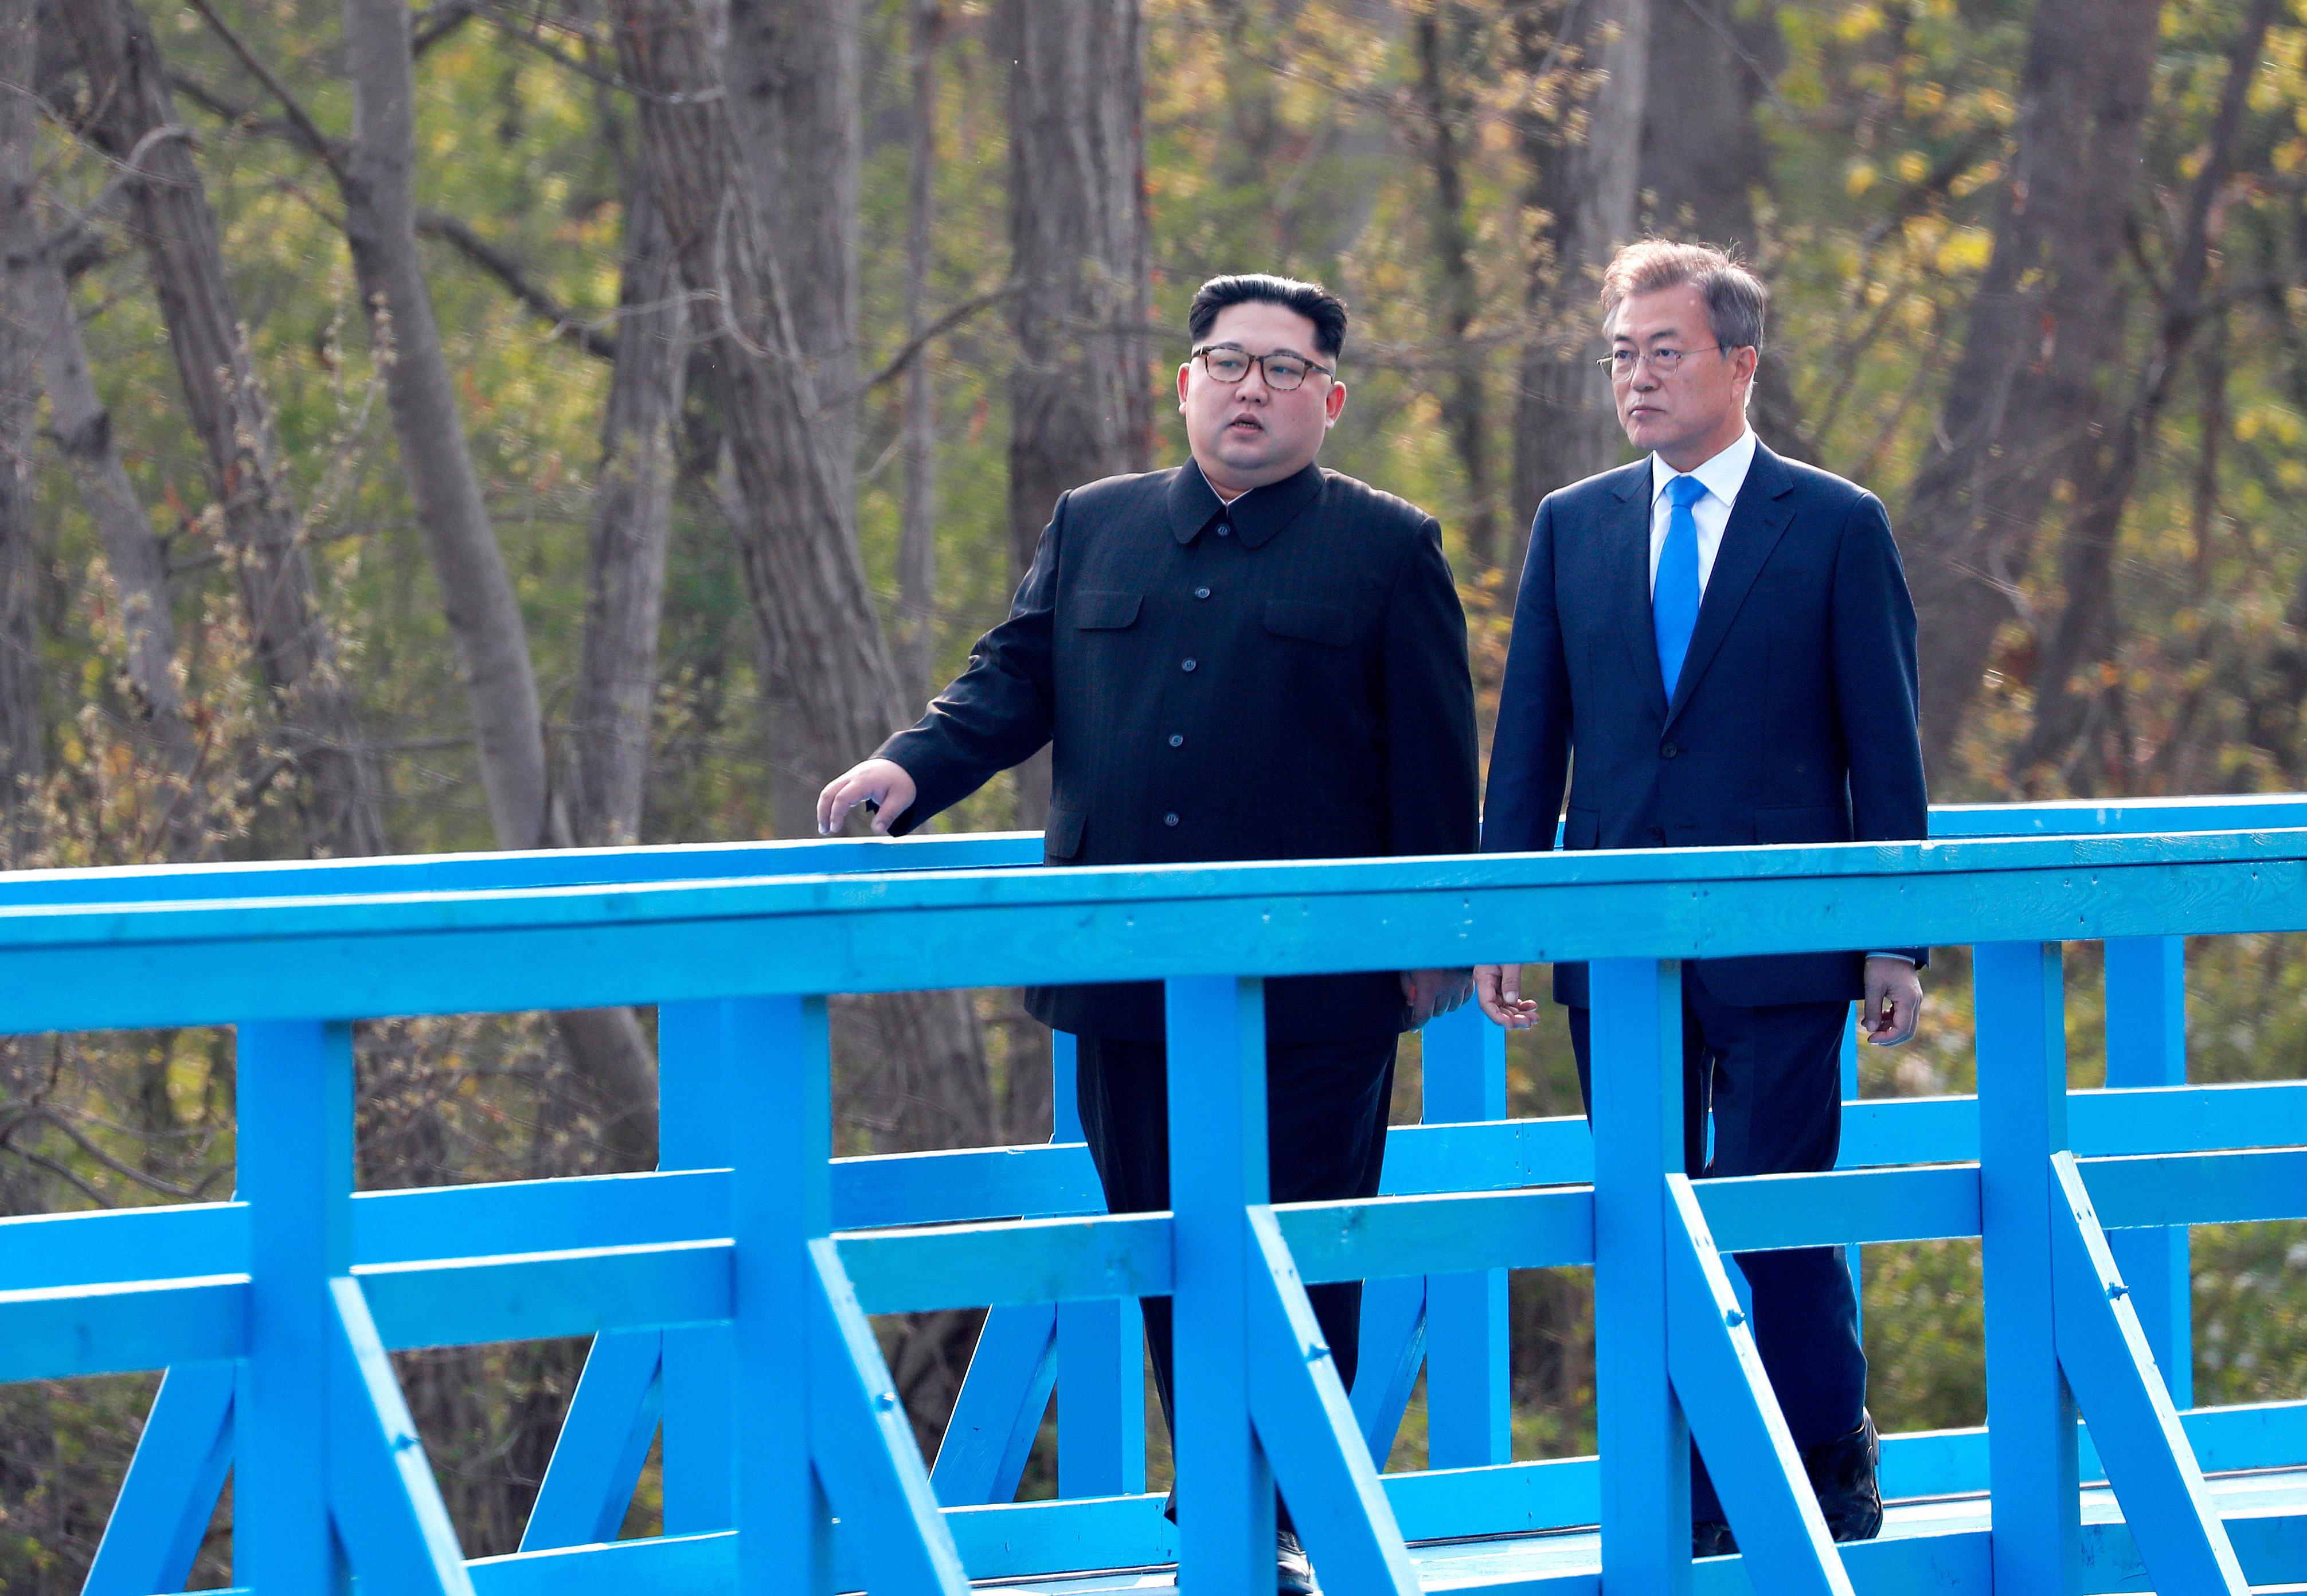 North Korean jogging bodyguards run alongside Kim Jong Un's limo